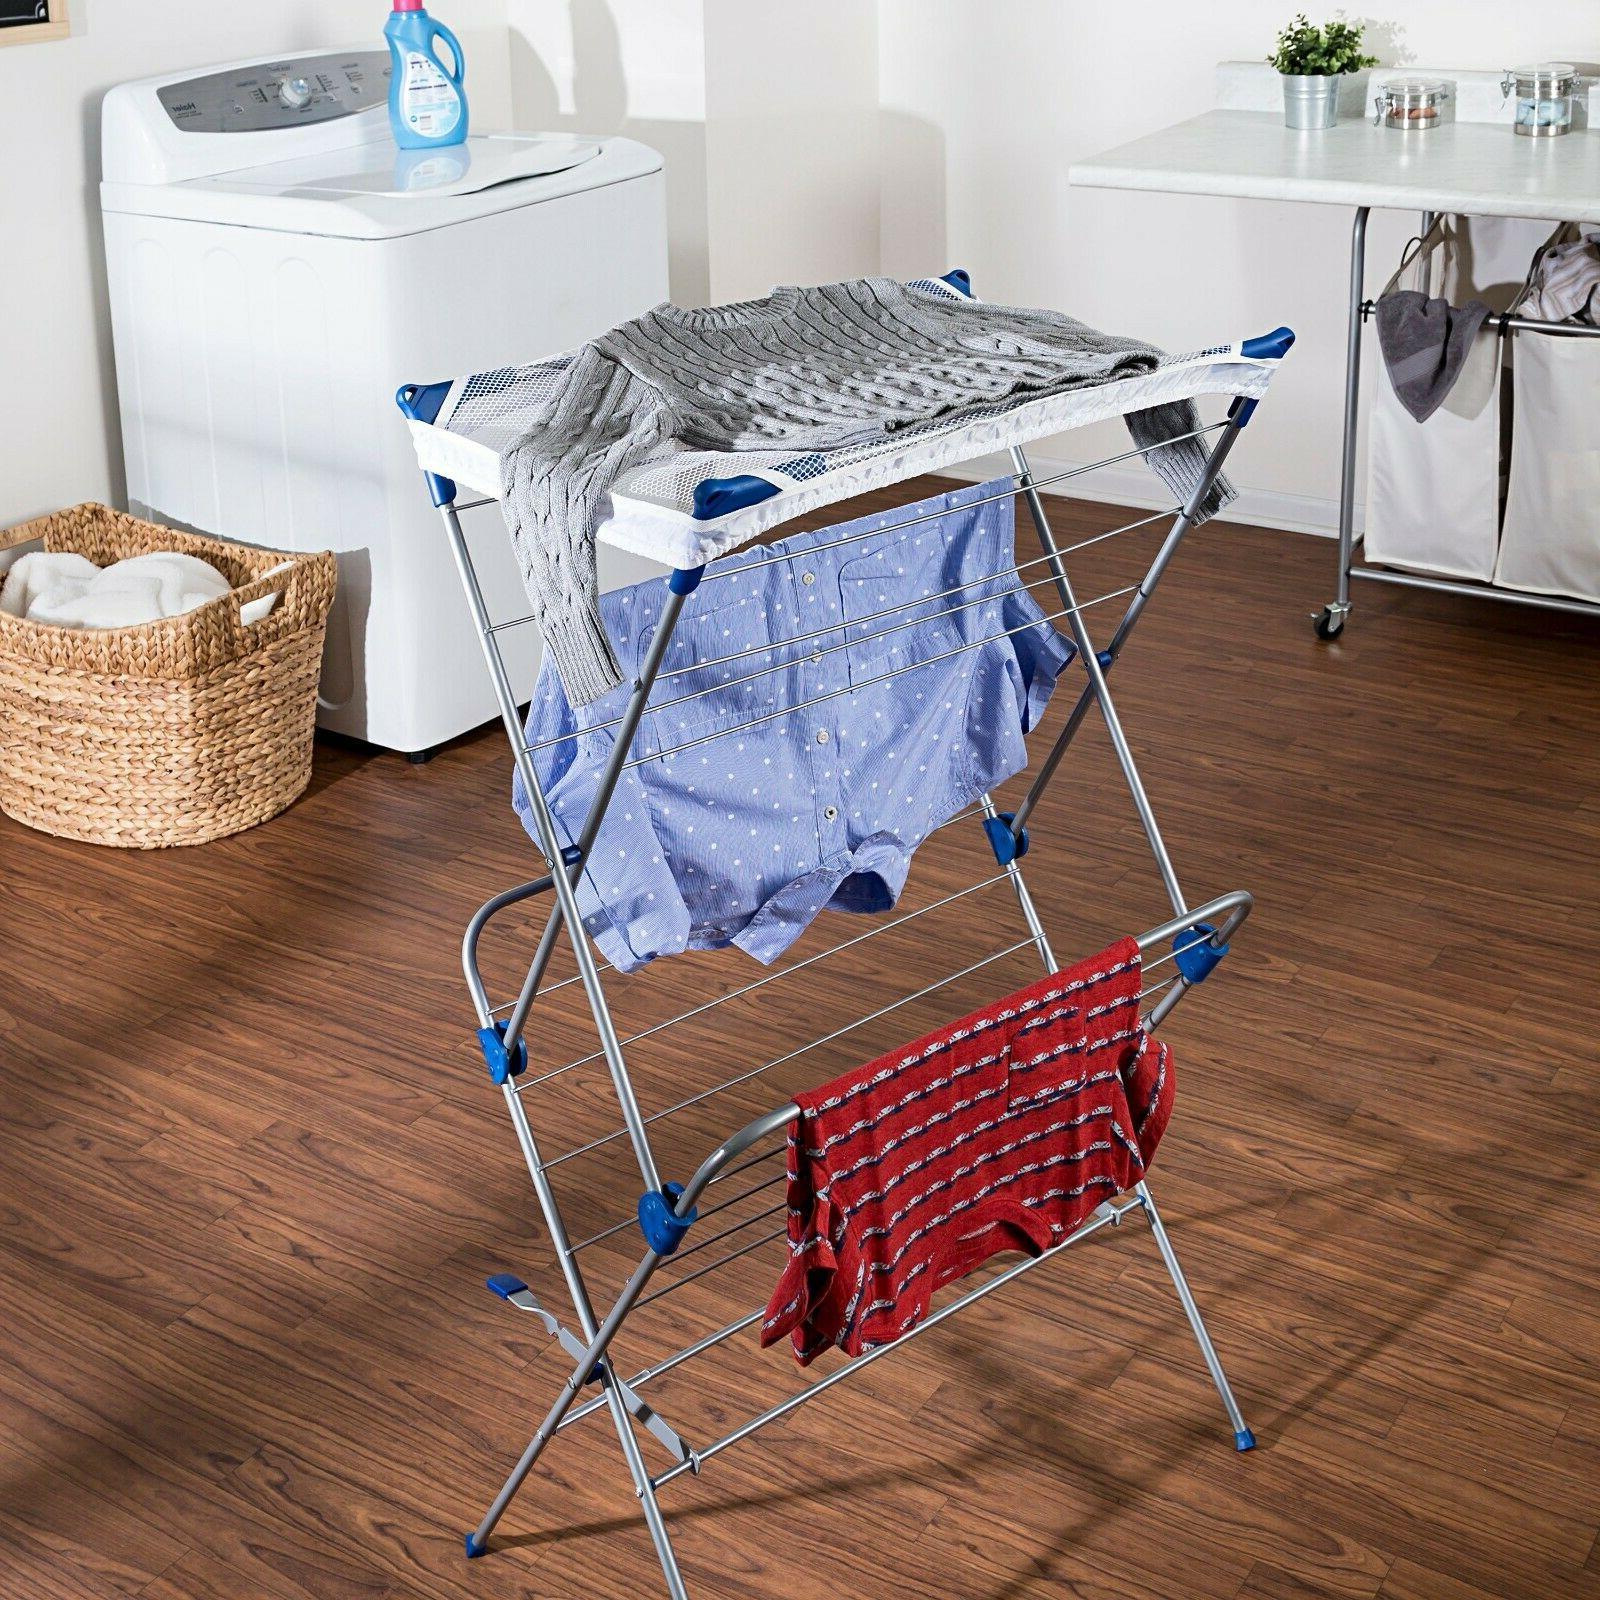 Honey 2-Tier Mesh Top Drying Rack, Silver/Blue